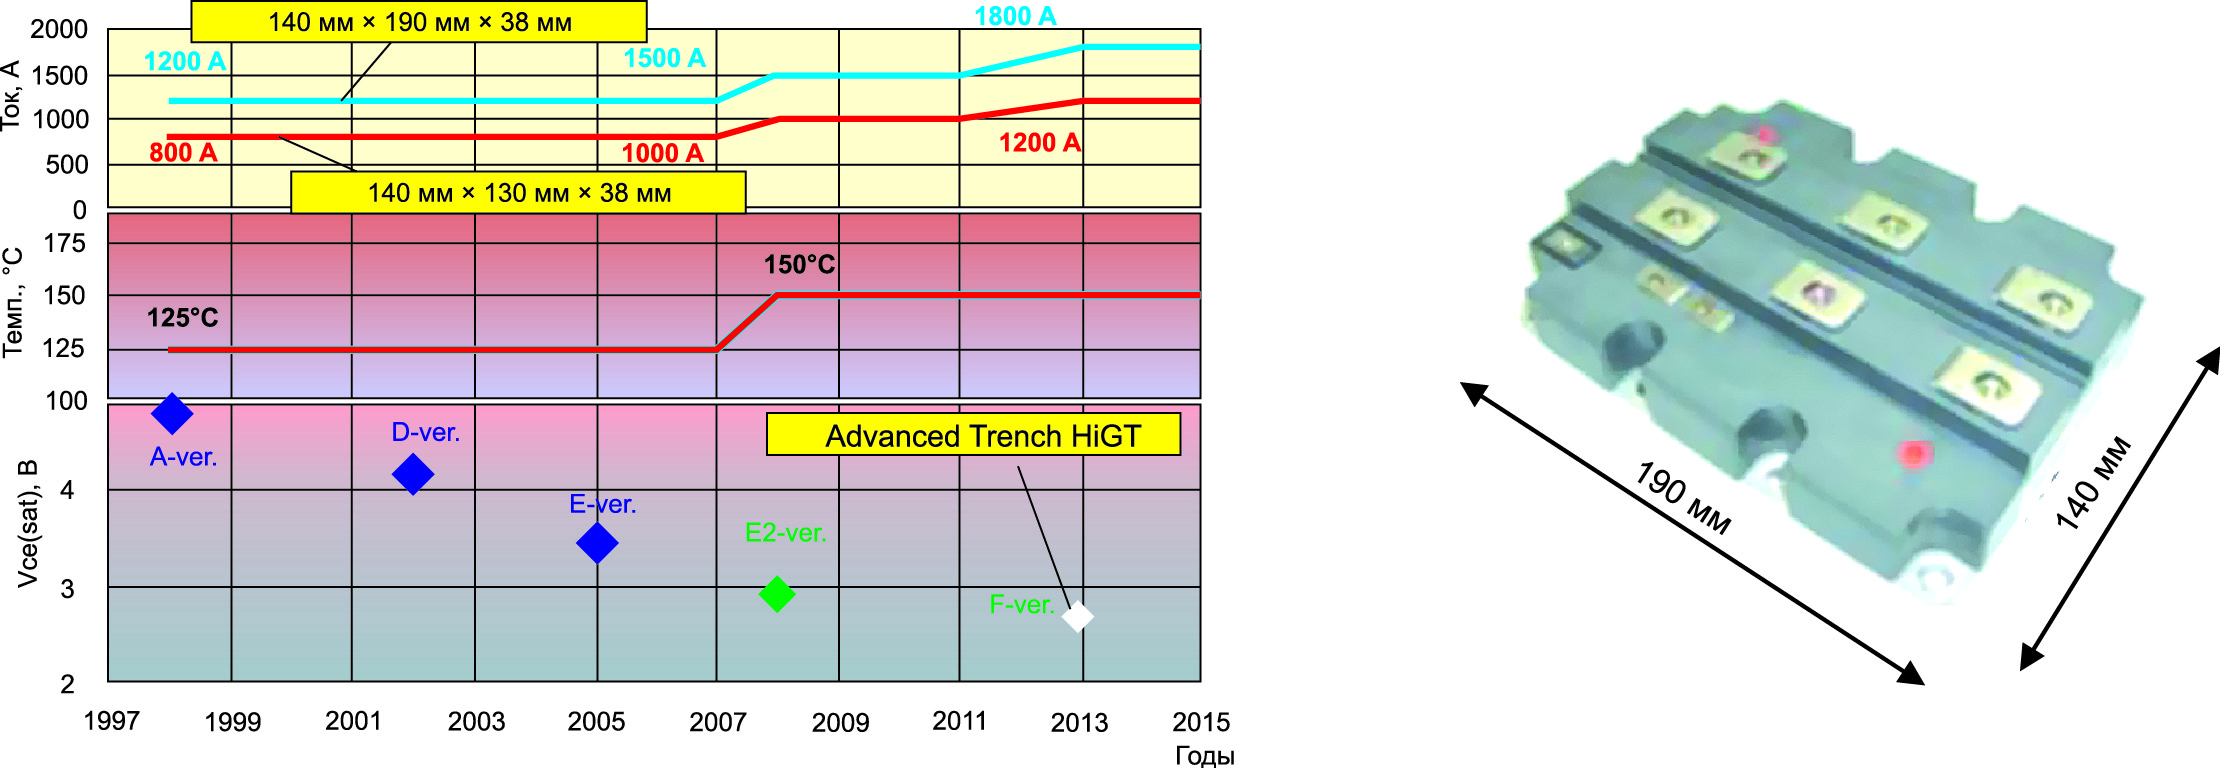 Тенденция развития IGBT-модуля компании Hitachi с рабочим напряжением 3,3 кВ (слева) и внешний вид IGBT-модуля с габаритами 140×190 мм (справа)